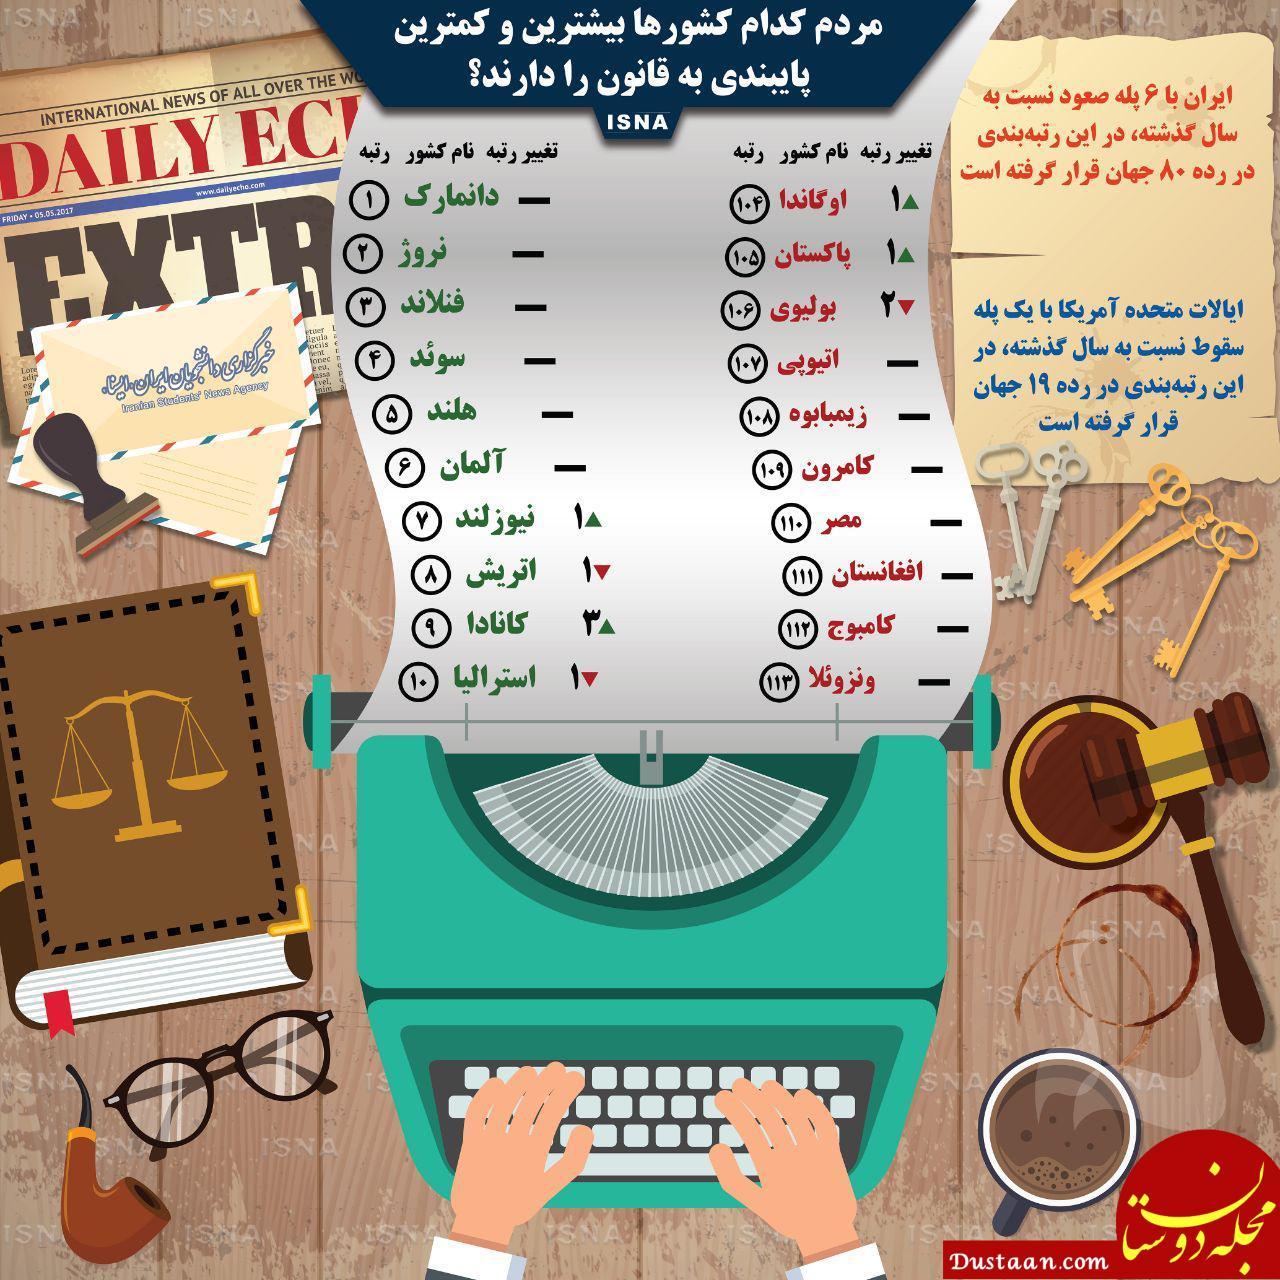 www.dustaan.com مردم کدام کشورها بیشترین و کمترین پایبندی به قانون را دادند؟ +اینفوگرافیک